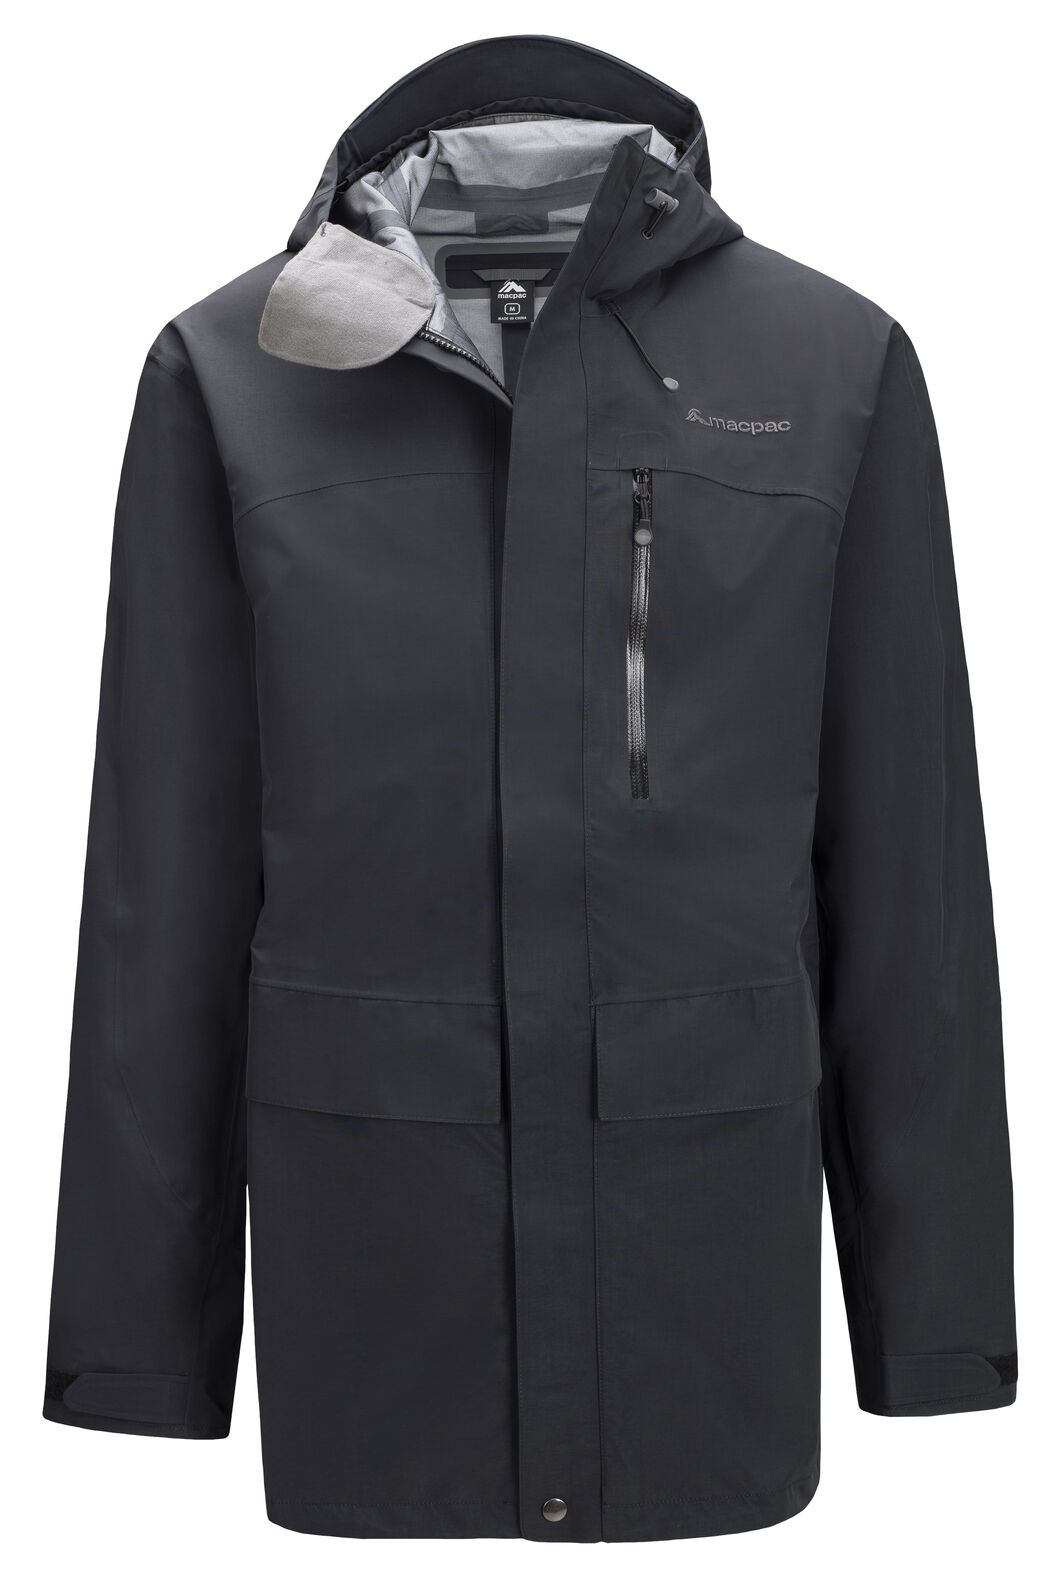 Macpac Men's Resolution Pertex® Rain Jacket, Black, hi-res